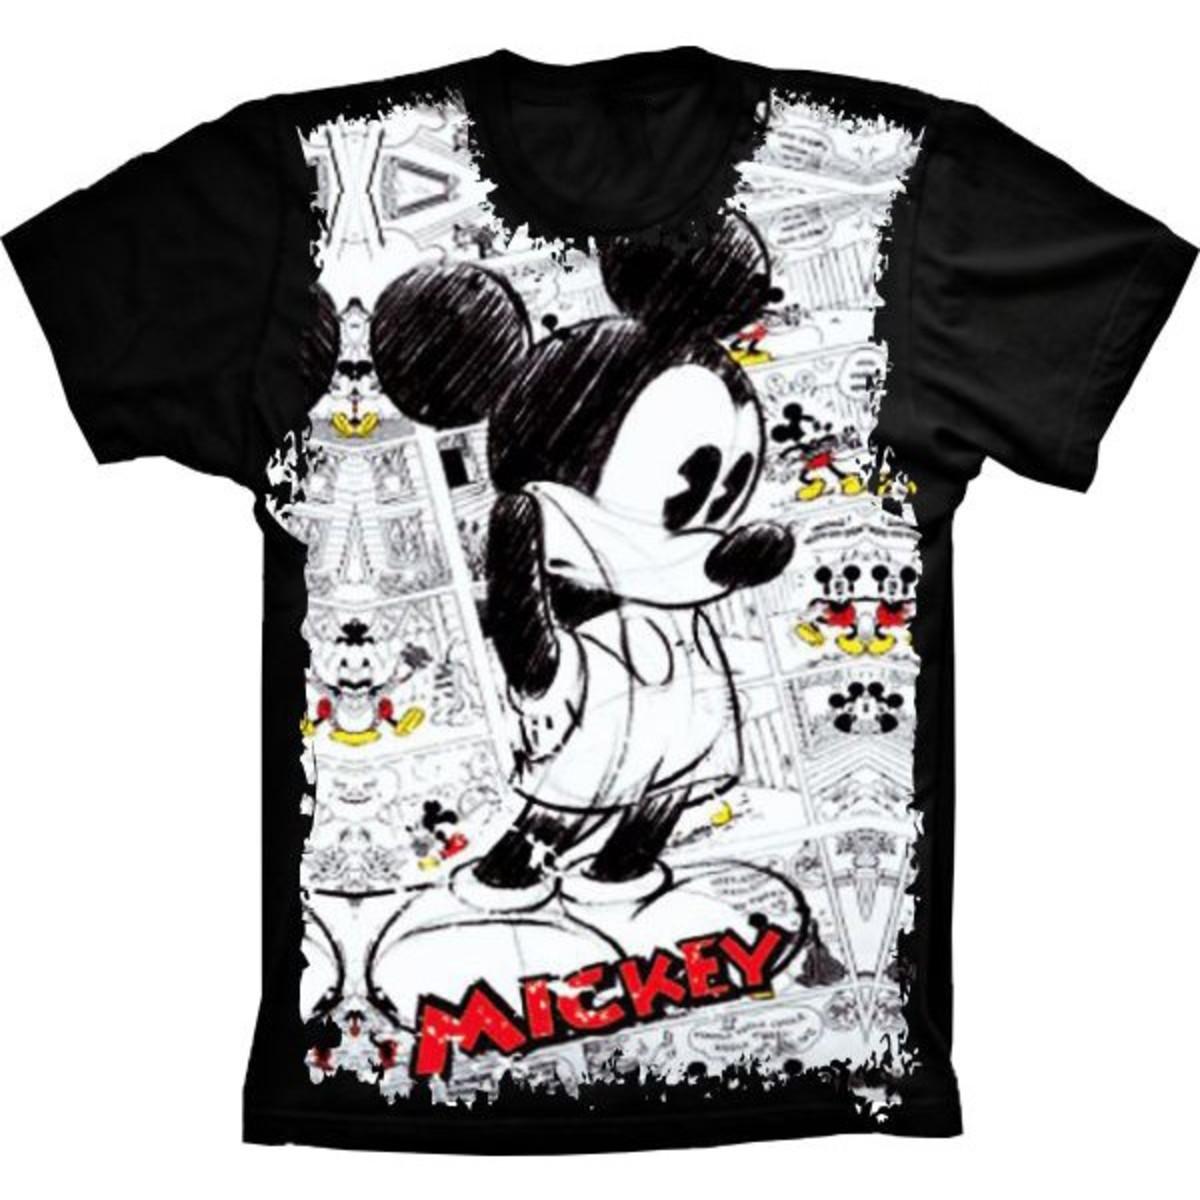 53475cfd4 Camiseta Infantil Mickey Pensativo no Elo7